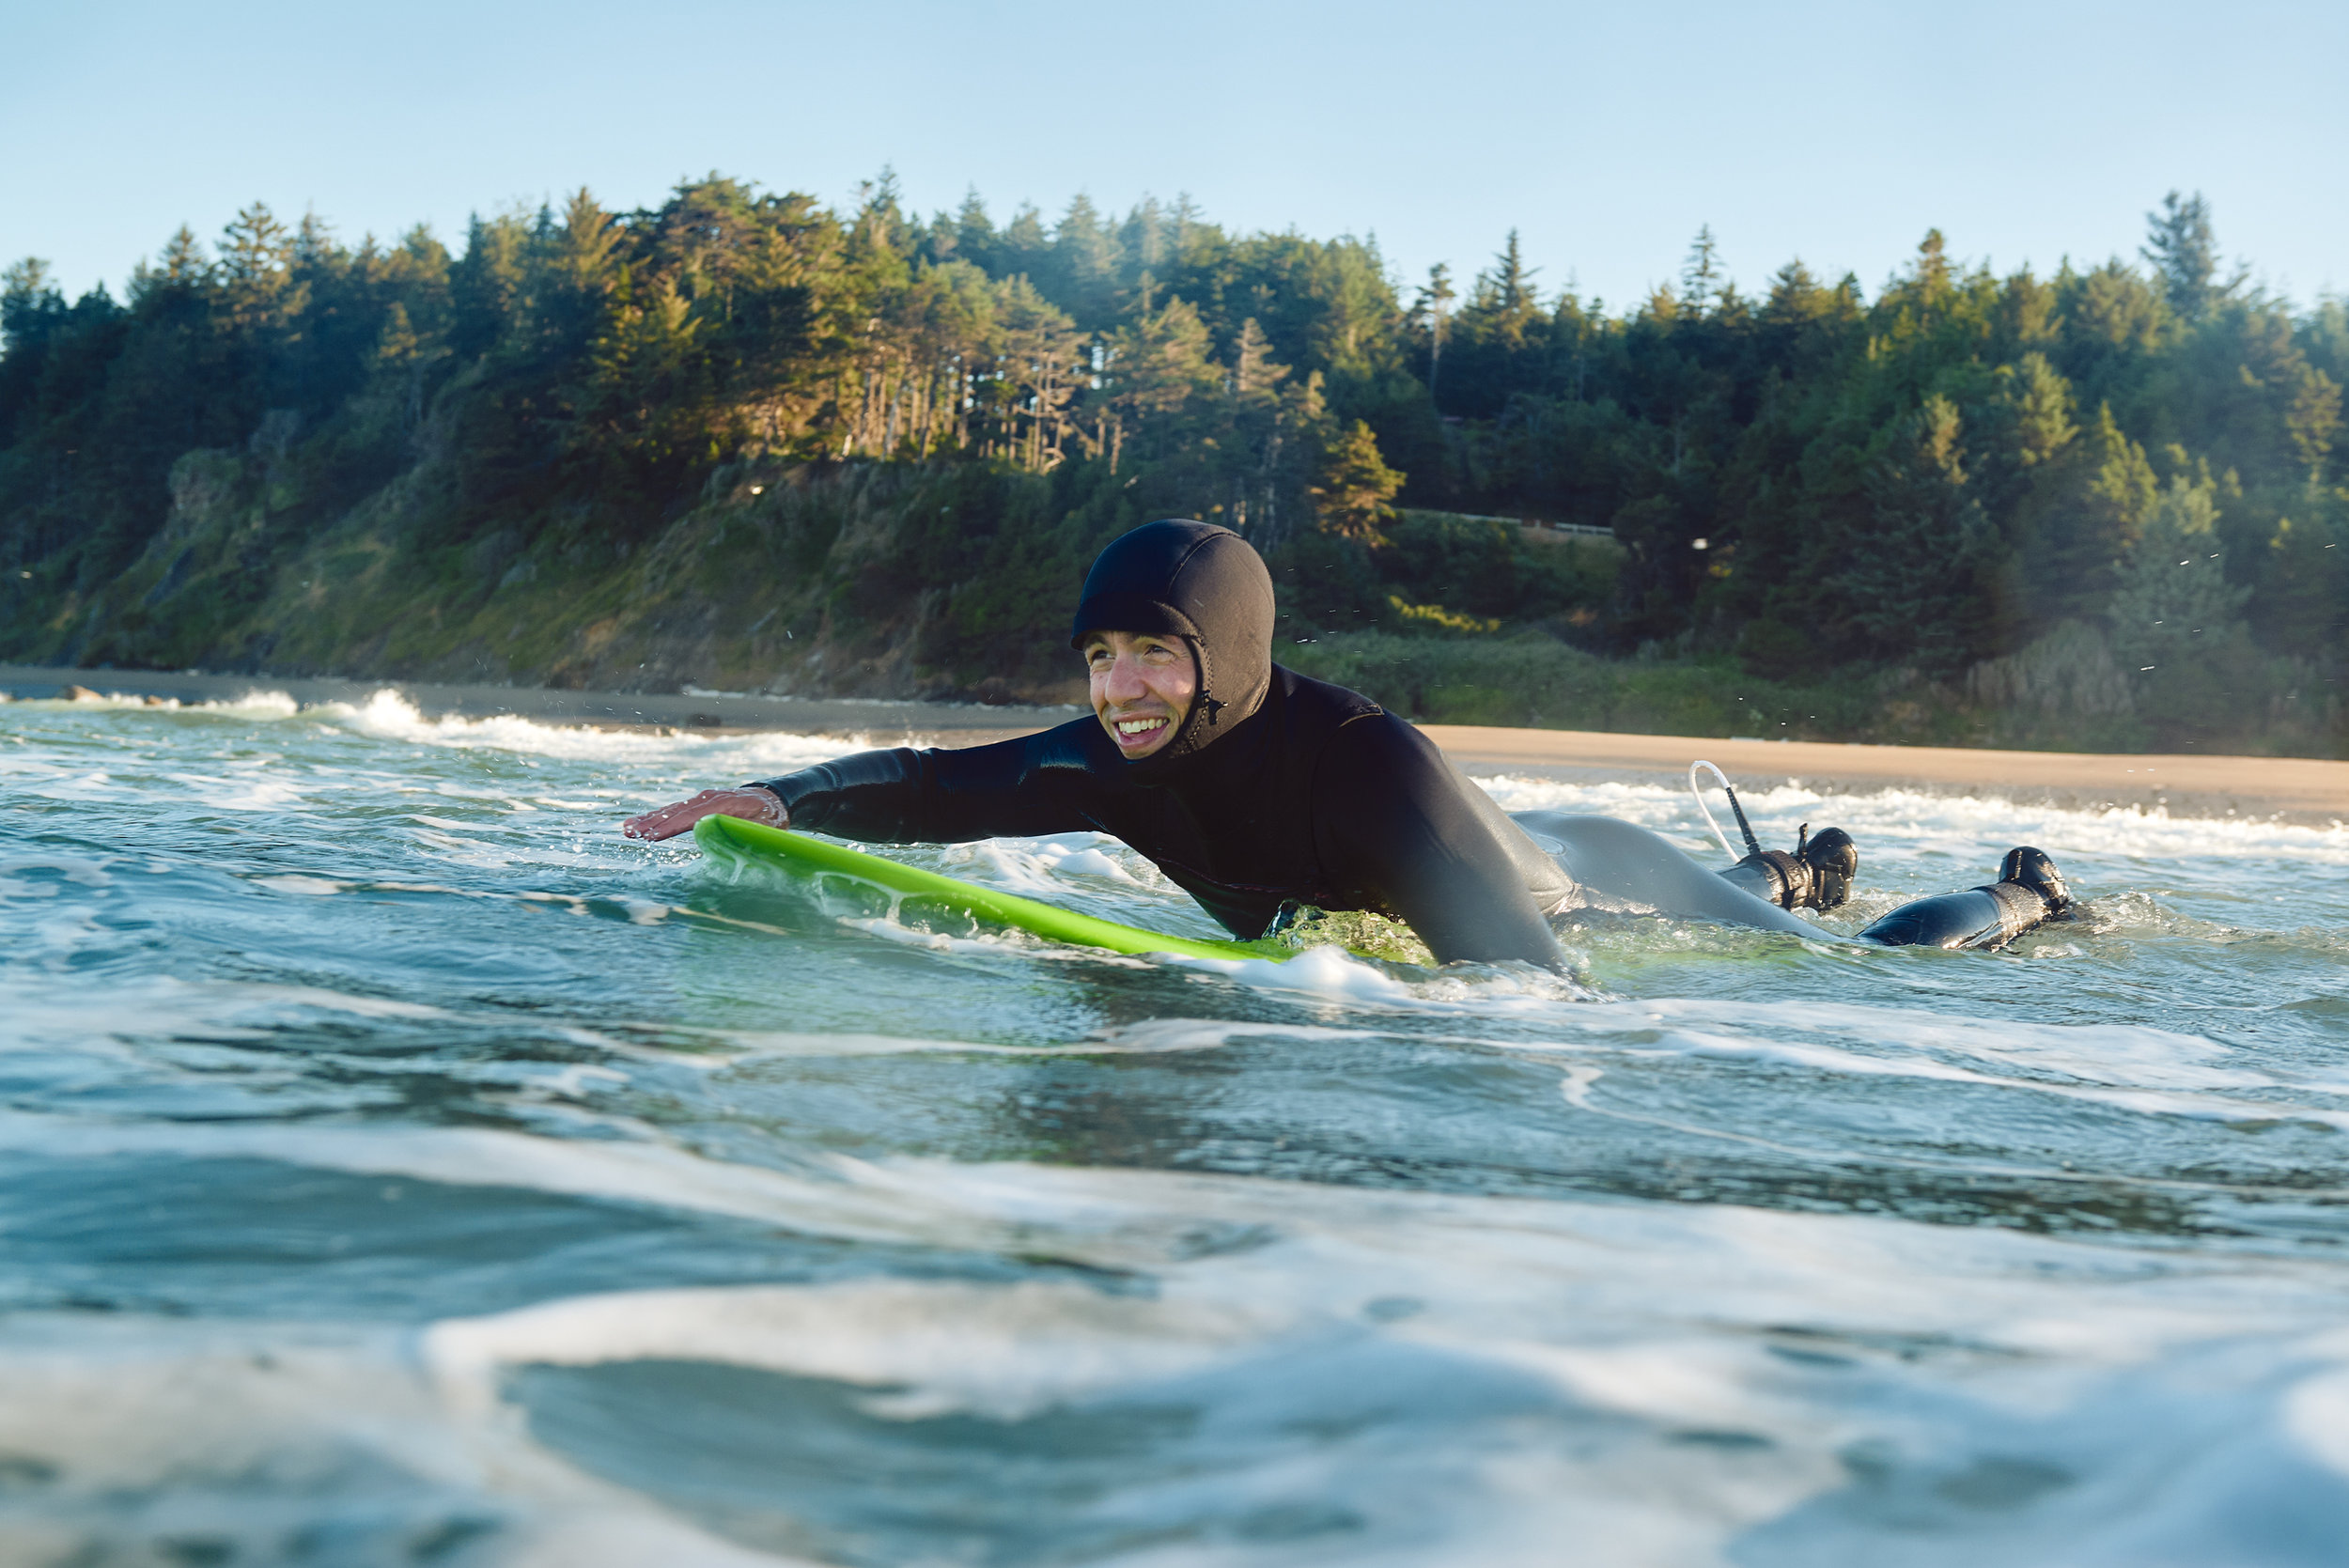 portorford_surfing_006.tif.jpg